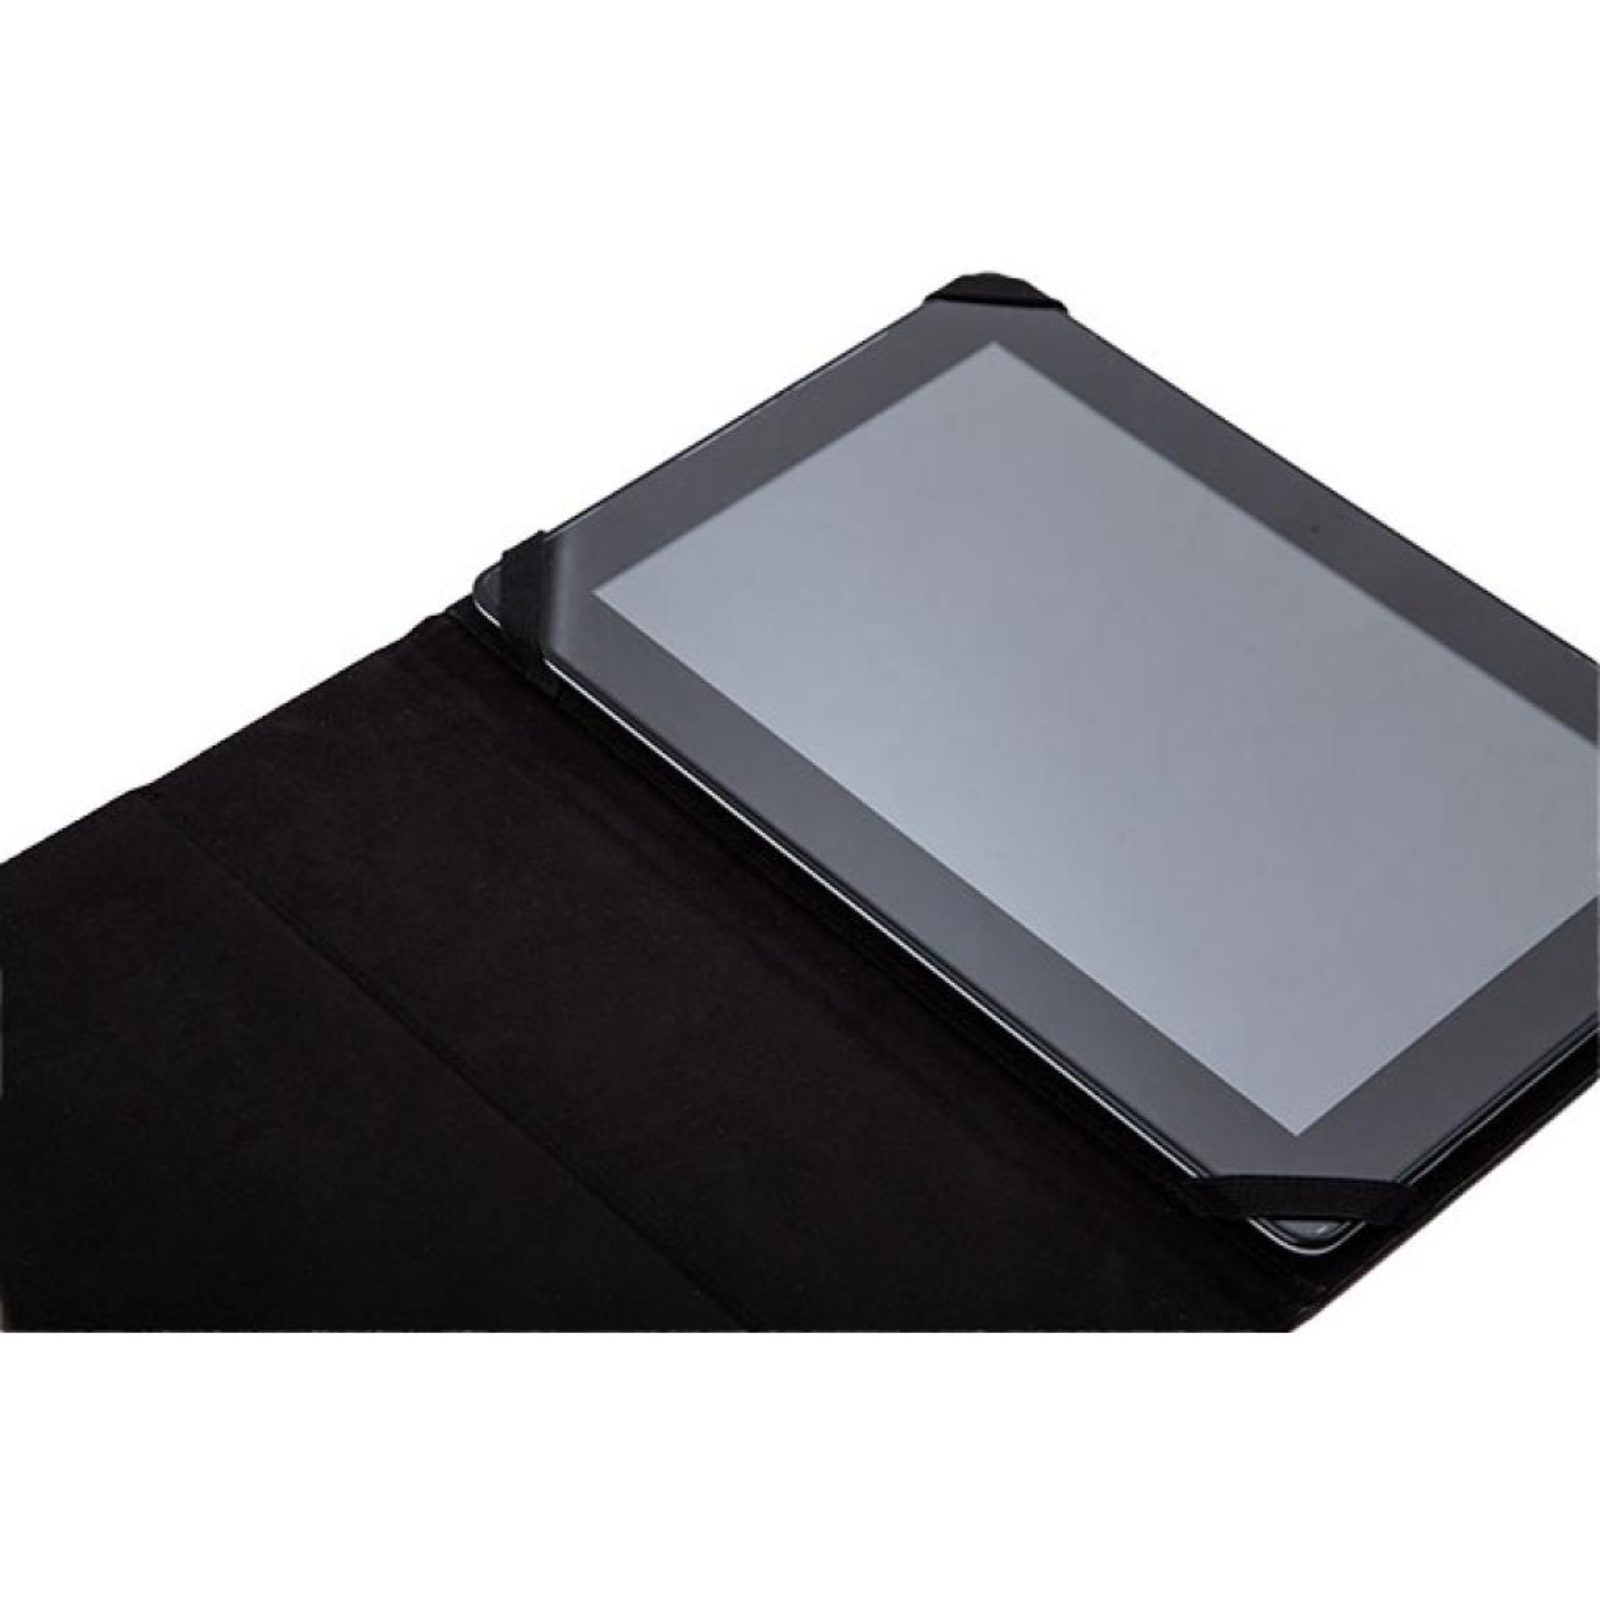 "Чехол для планшета 10""-10.1"" Cover Stand Black Drobak (216892) изображение 3"